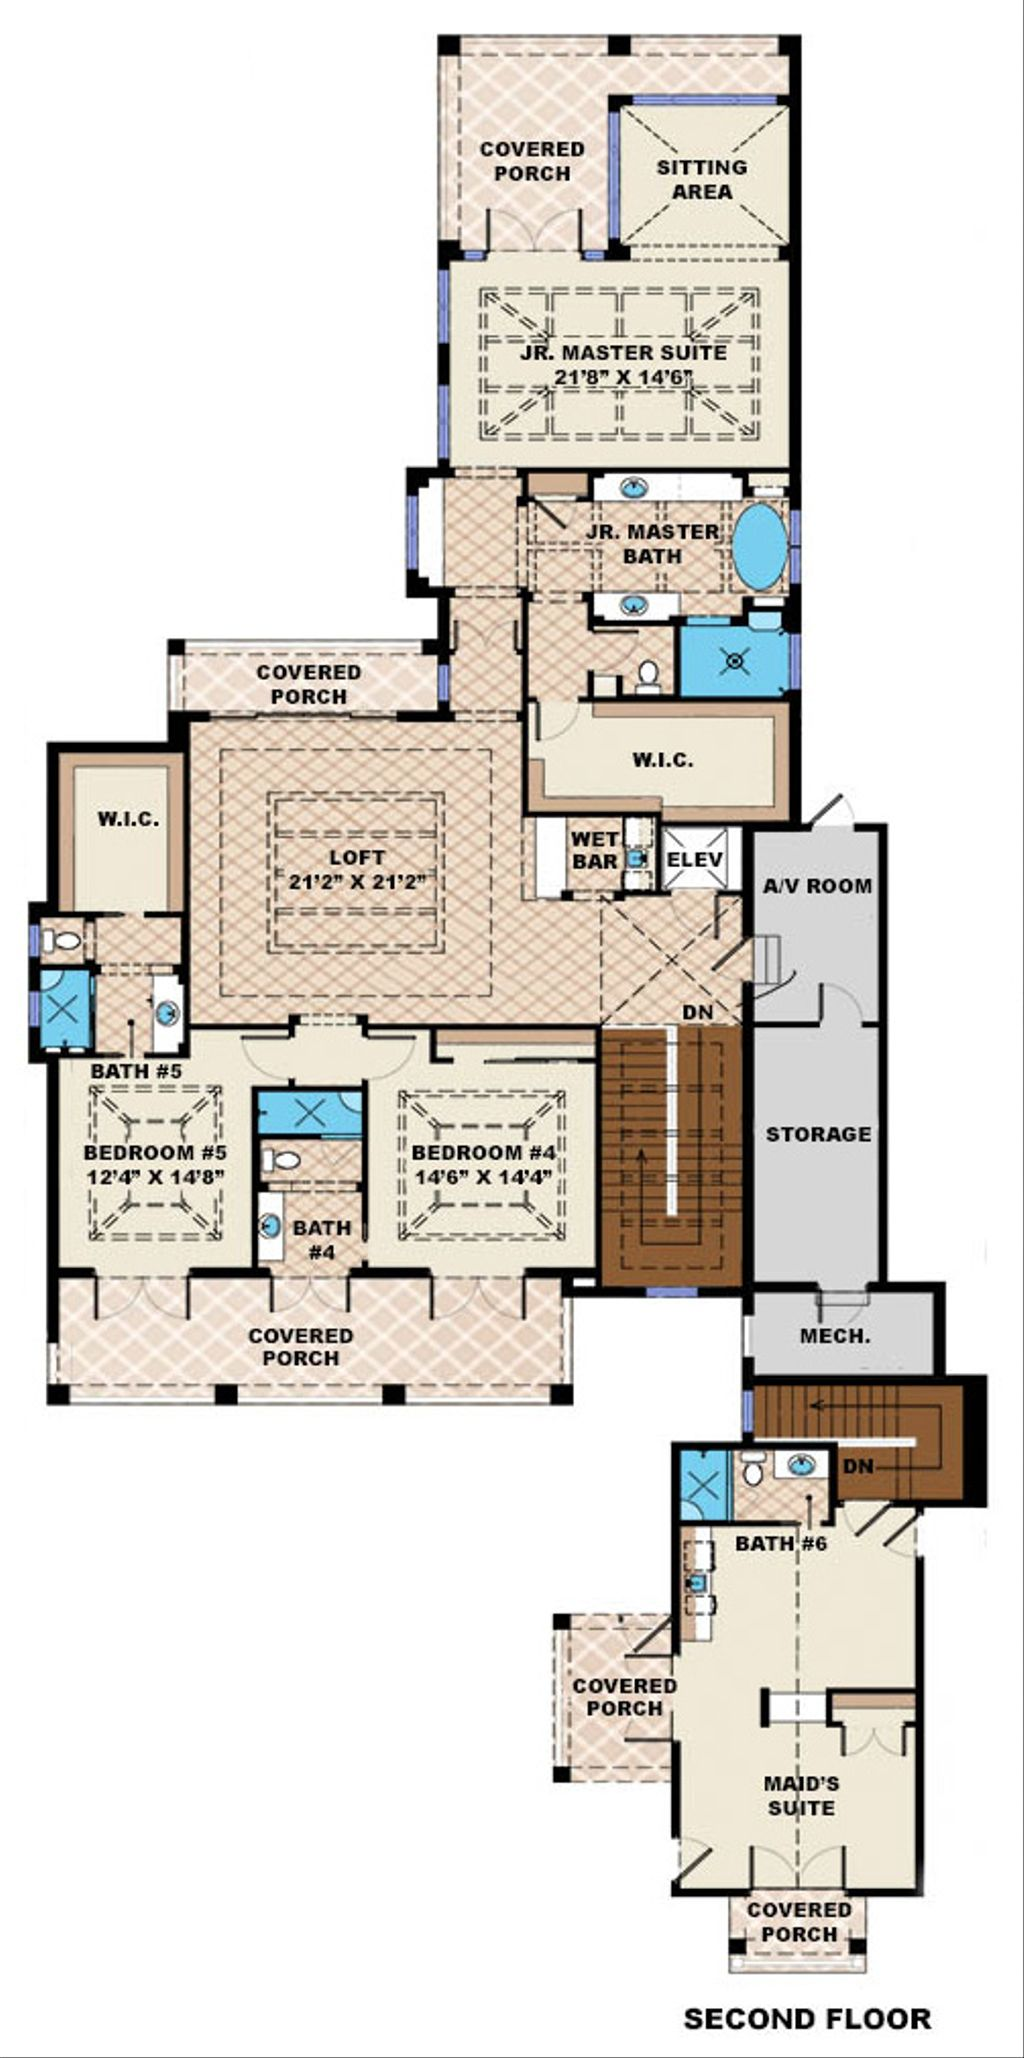 beach style house plan 6 beds 6 5 baths 10605 sq ft plan 27 462 rh houseplans com 6 bedroom house plans australia 6 bedroom house plans 3d